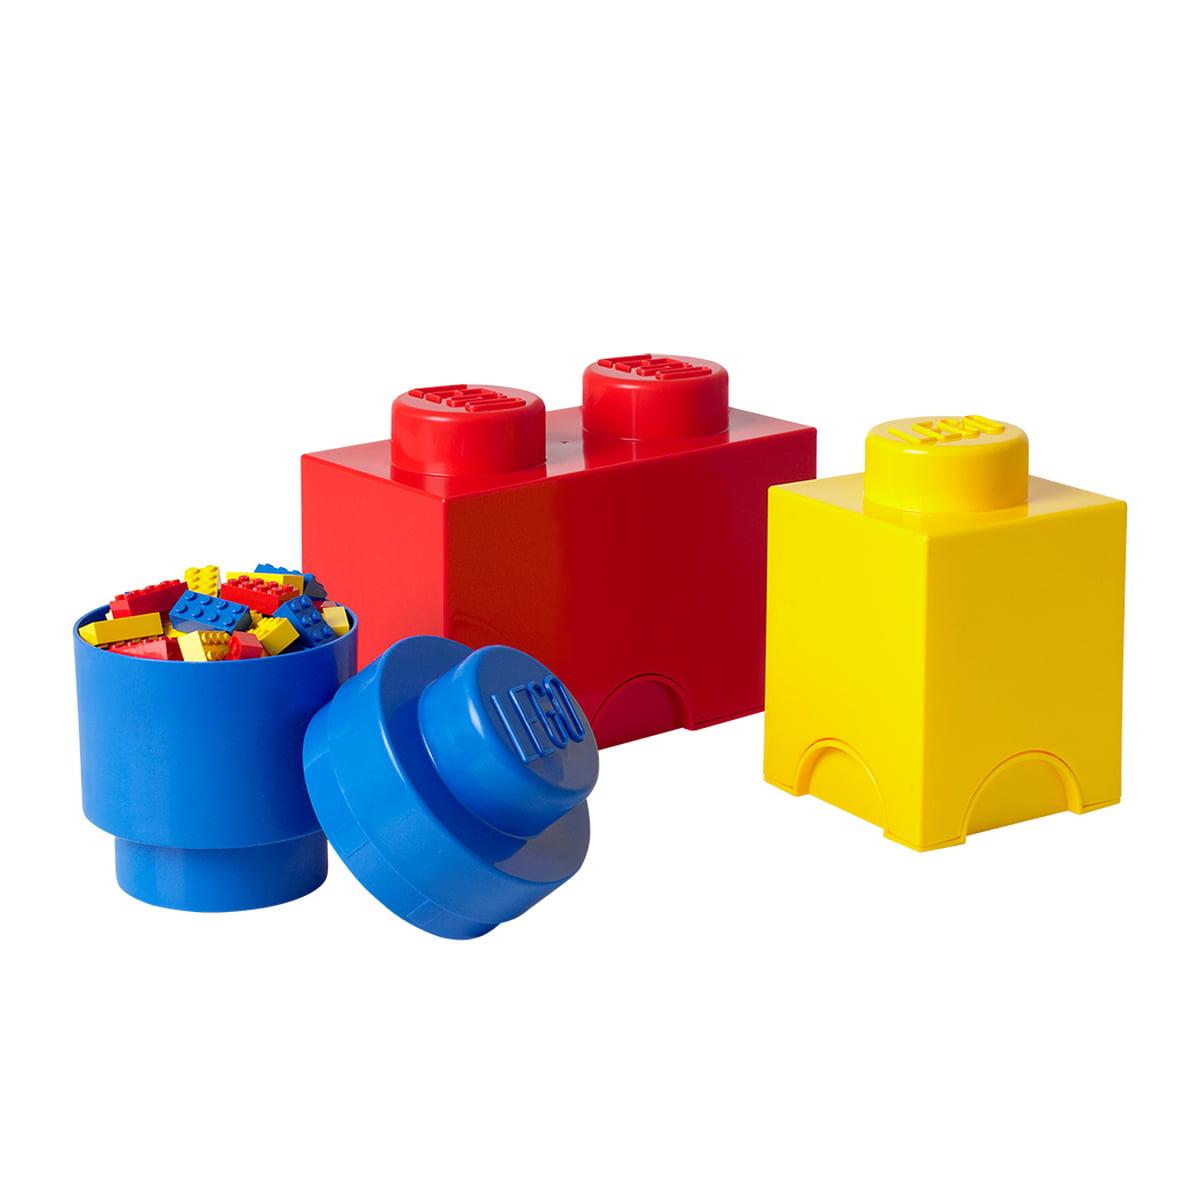 Storage Brick Multipack Set Of 3 By Lego